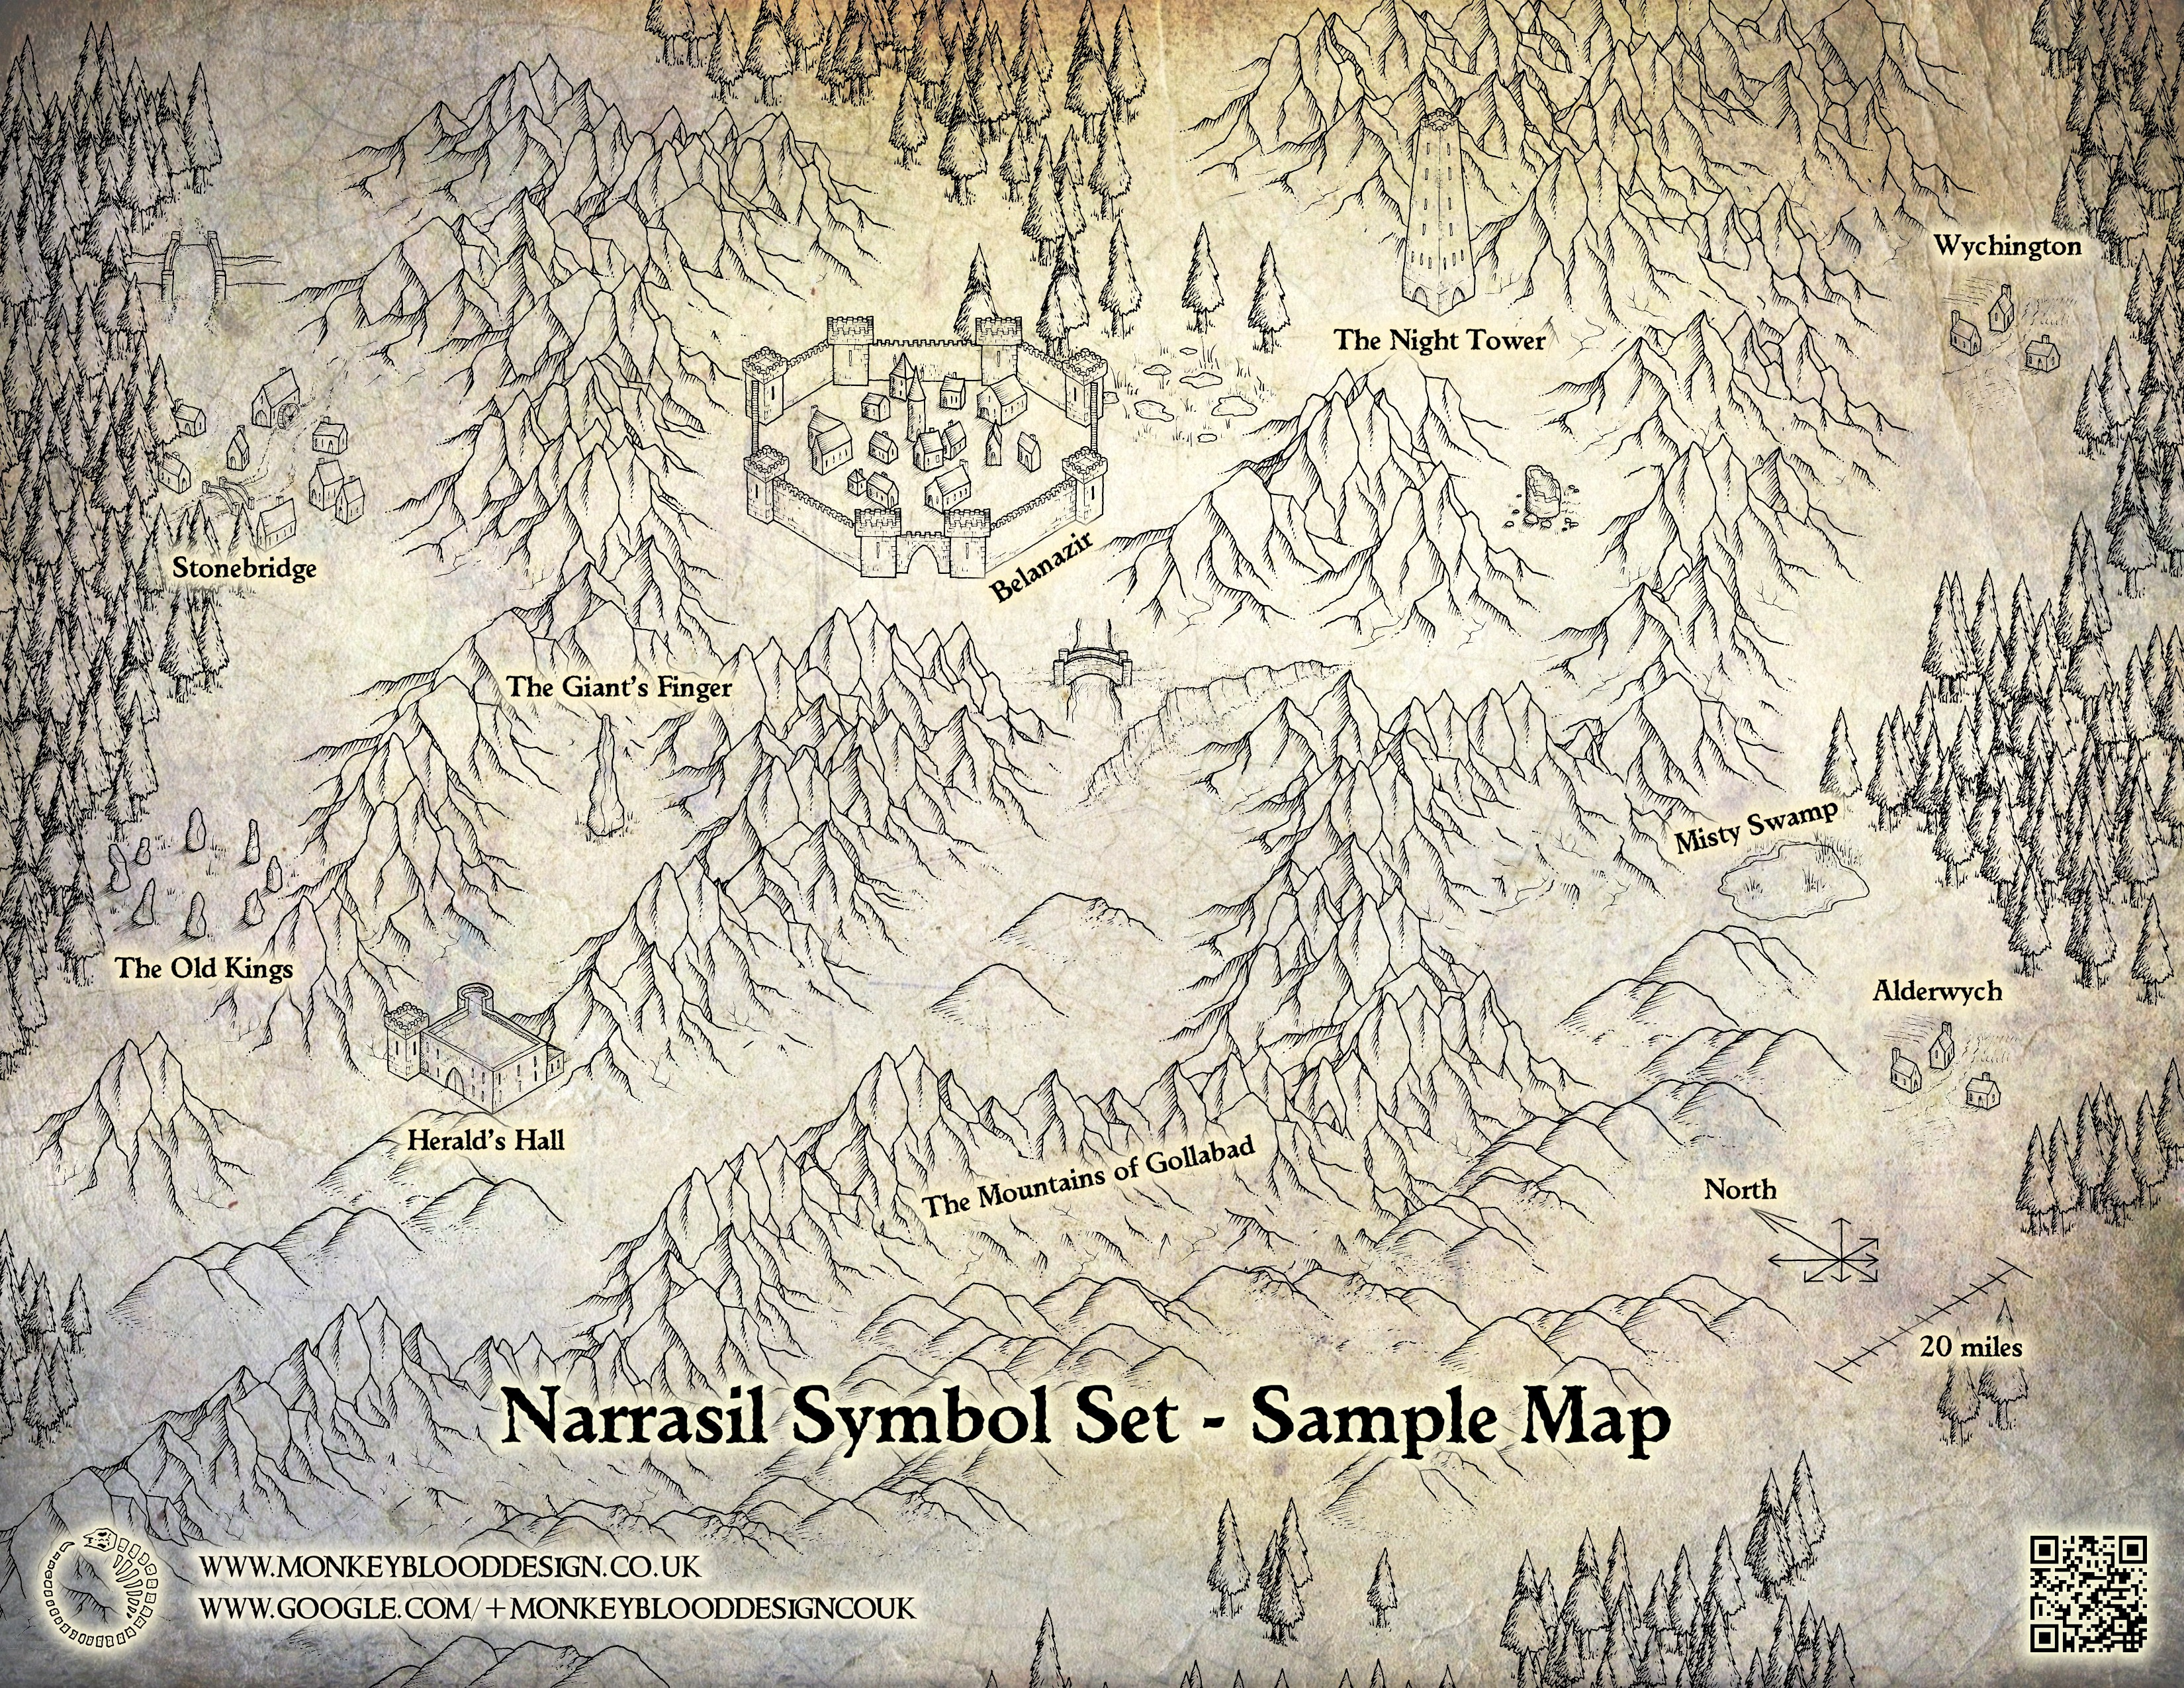 Narrasil Sample Map 1